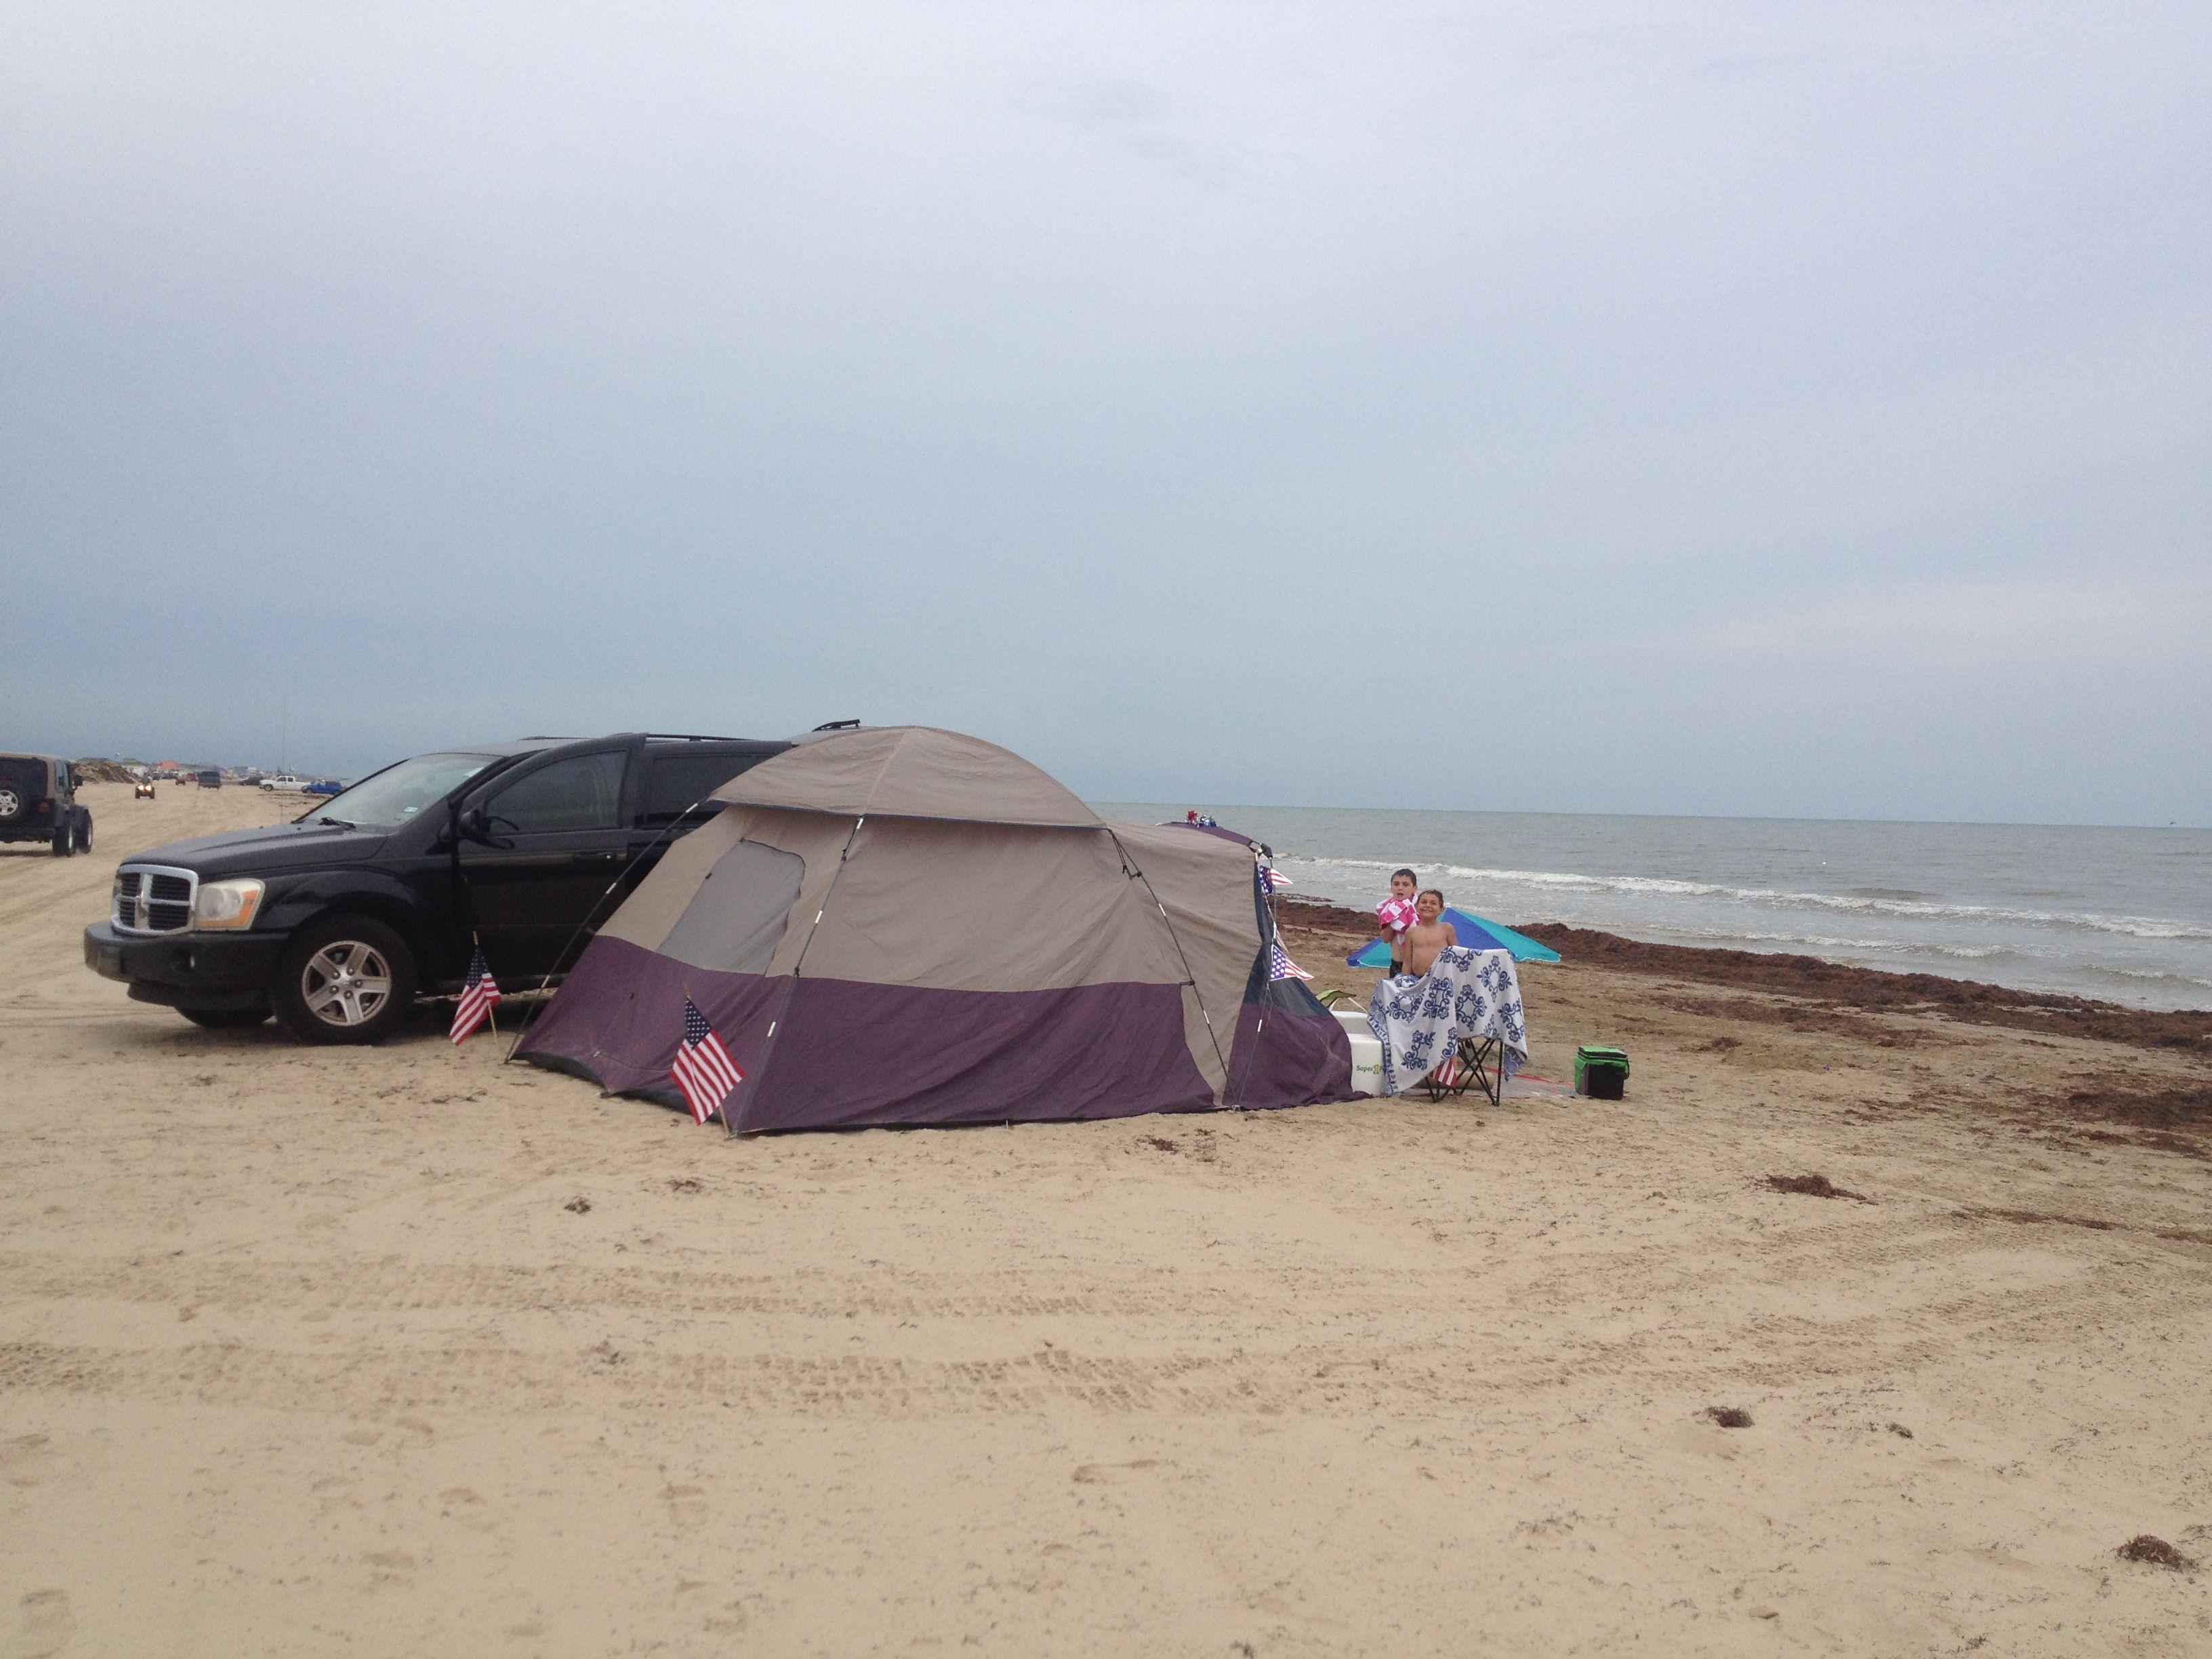 Tent Camping Bolivar Peninsula Galveston Tx 4th Of July 2017